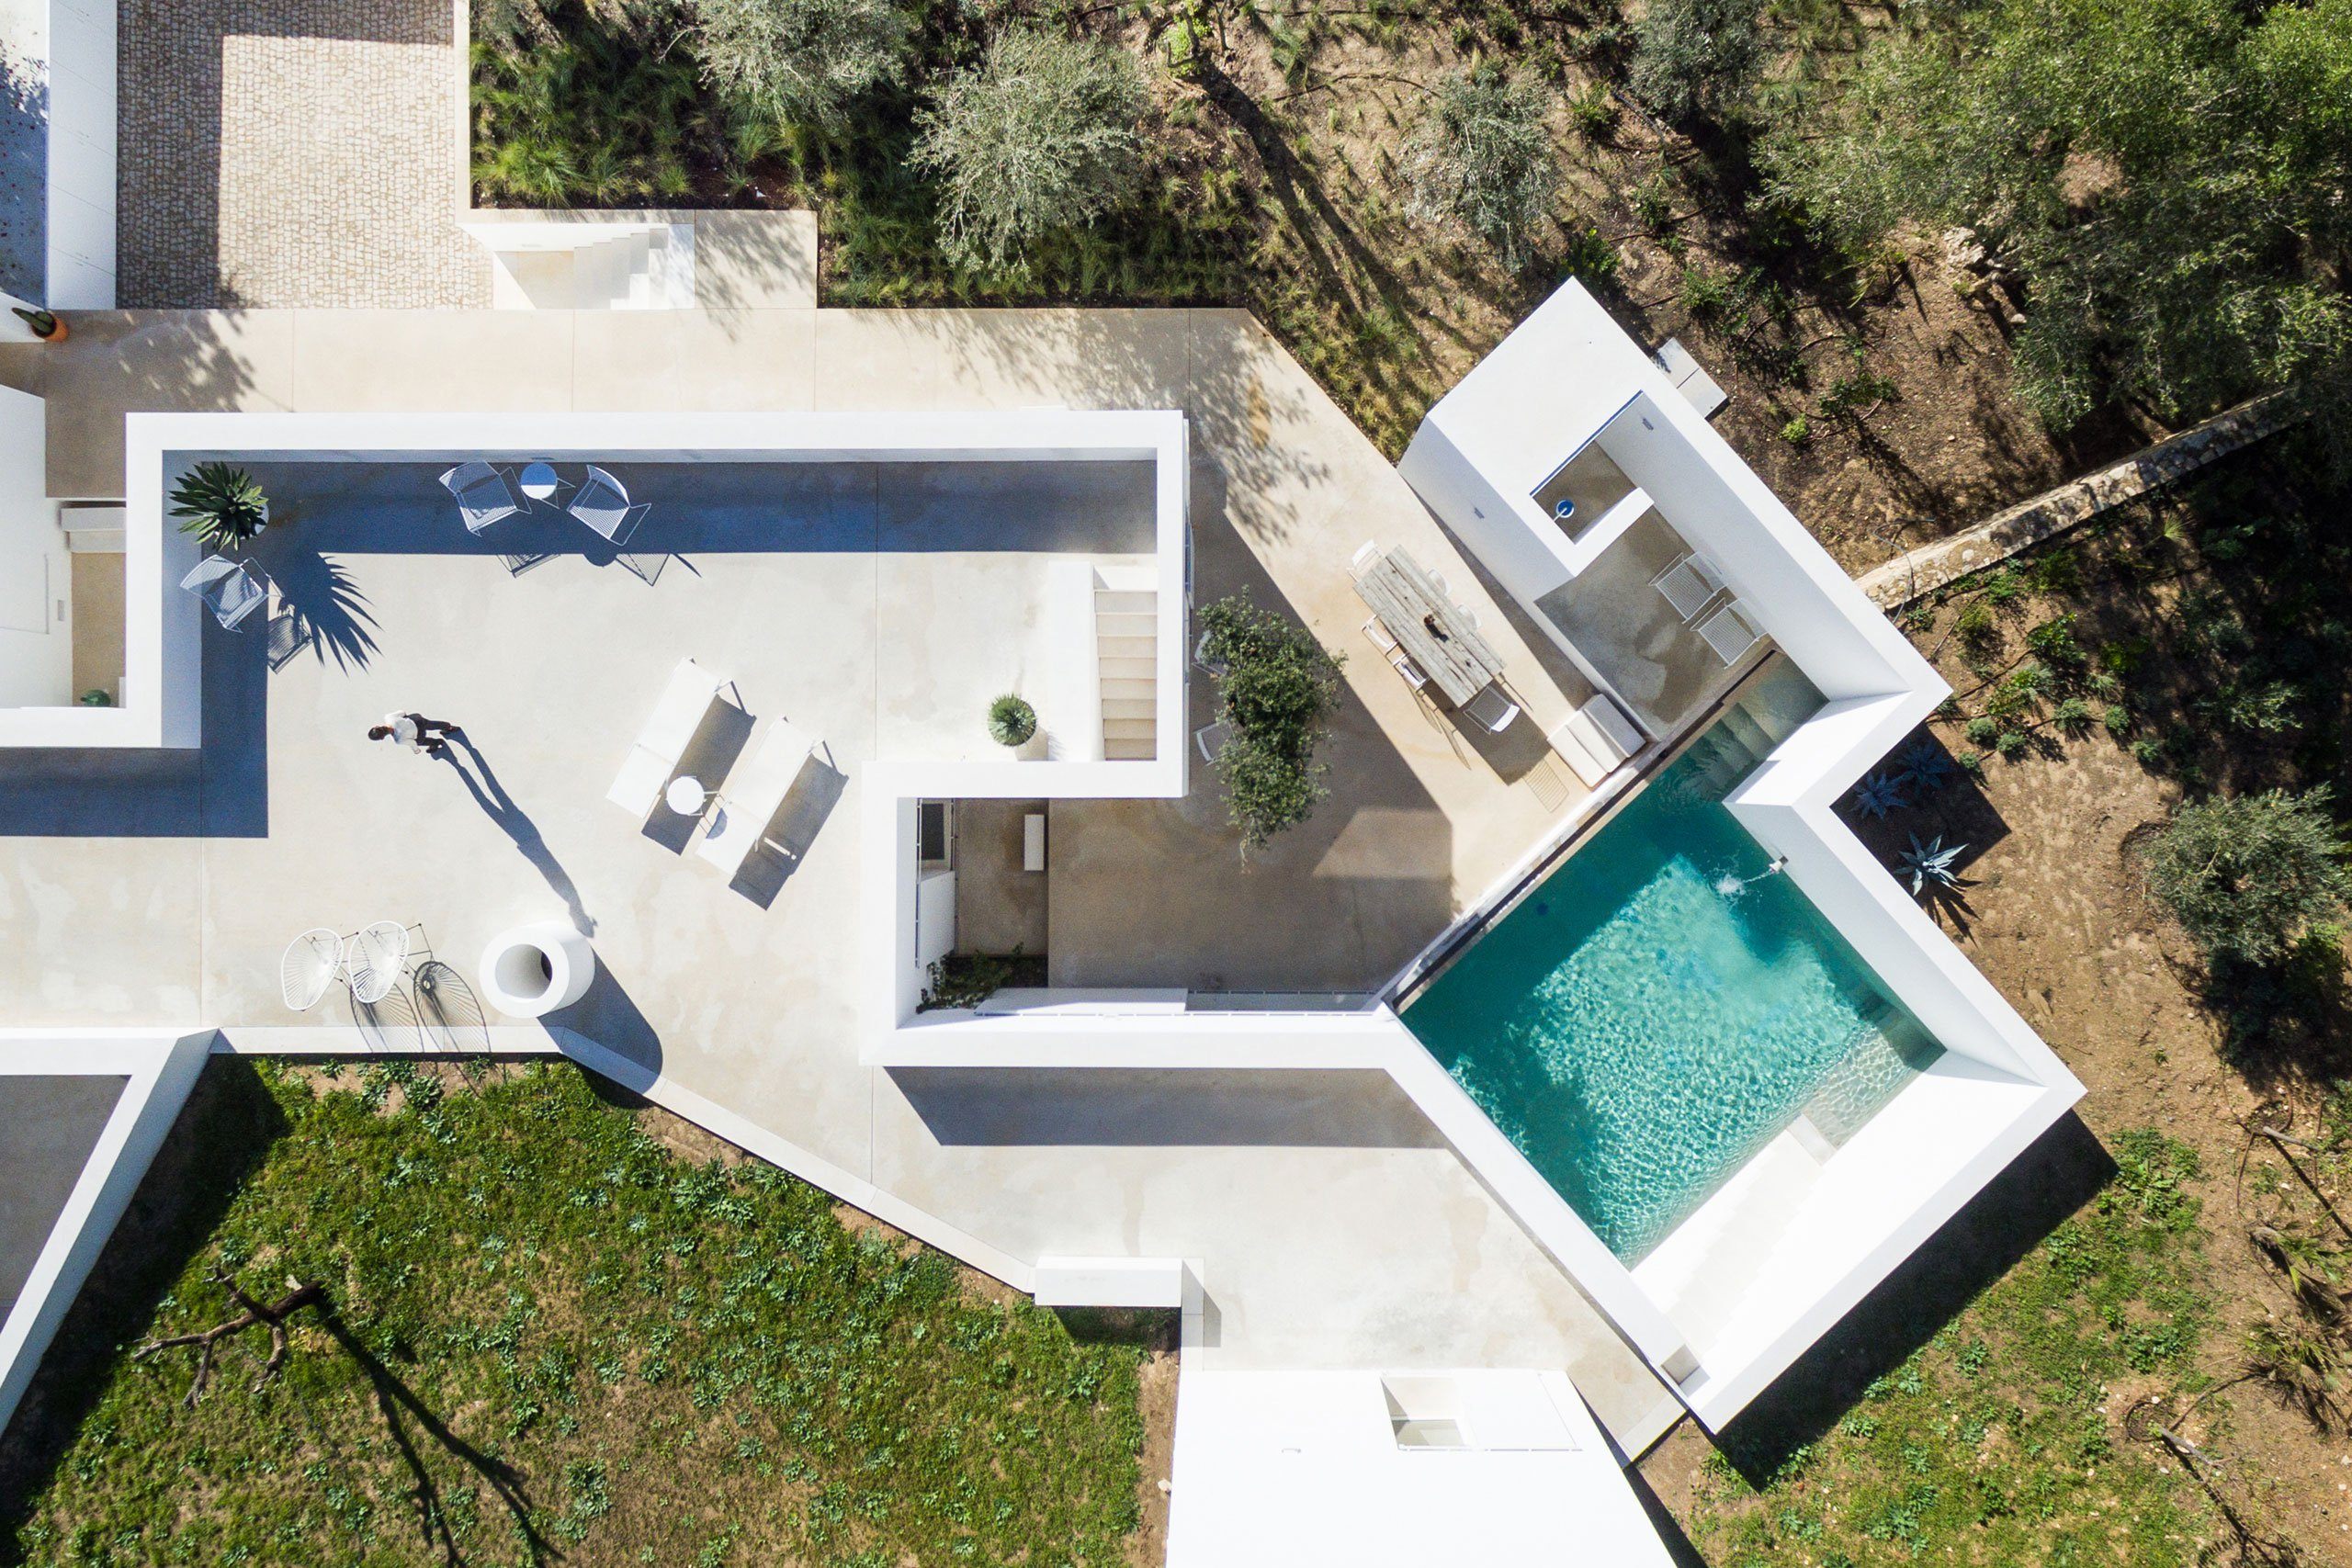 casa-luum-minimalizmus-a-portugal-videken-noko-03.jpg